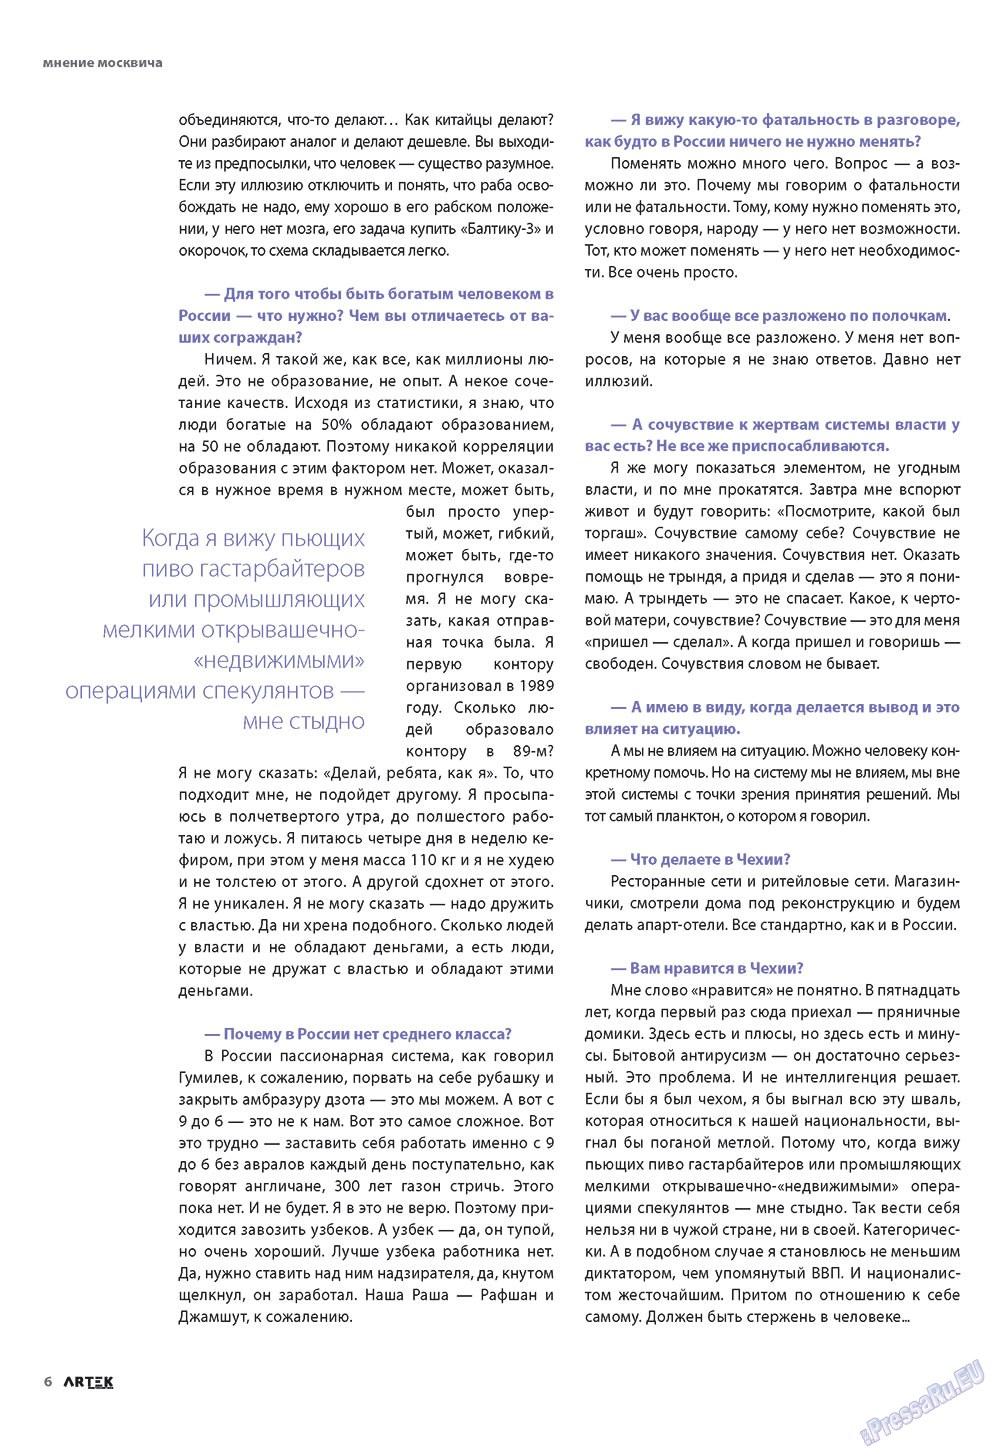 Артек (журнал). 2009 год, номер 4, стр. 6